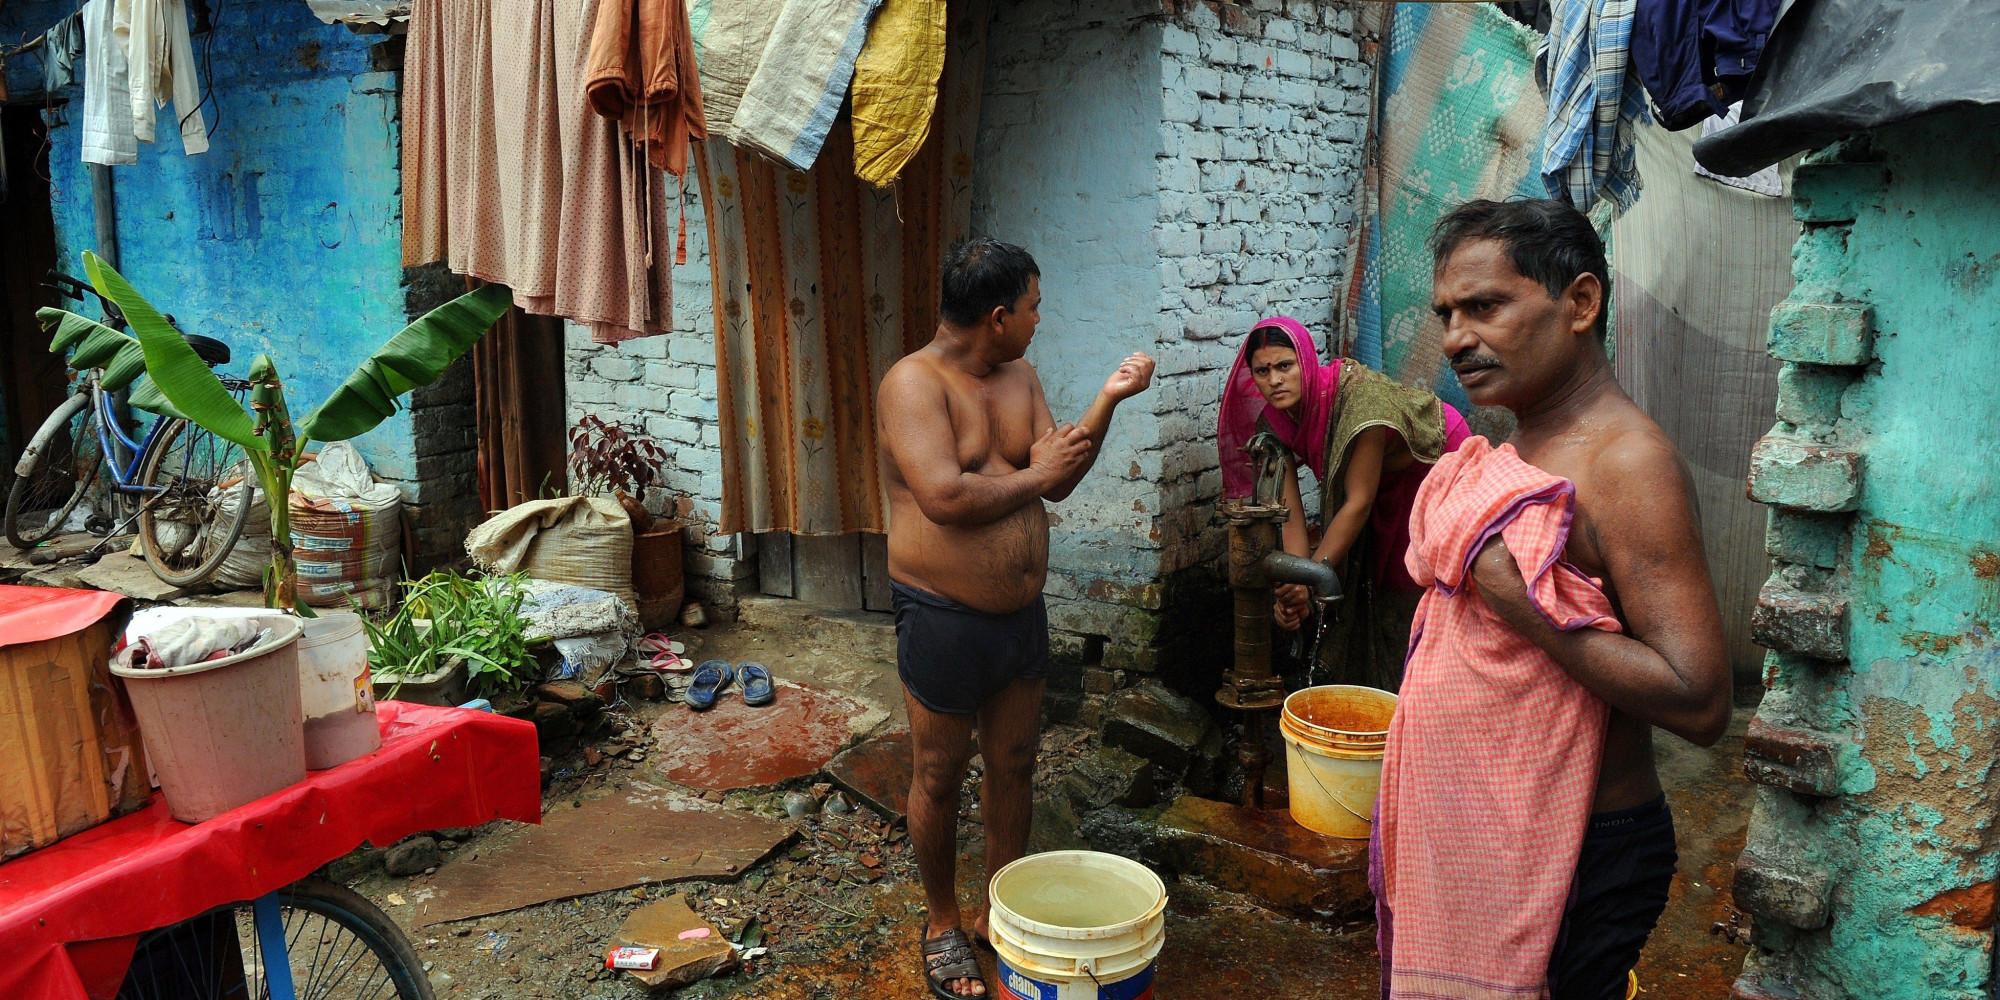 How to Make Sure Urban Slum-Dwellers Take Their Medicine ...